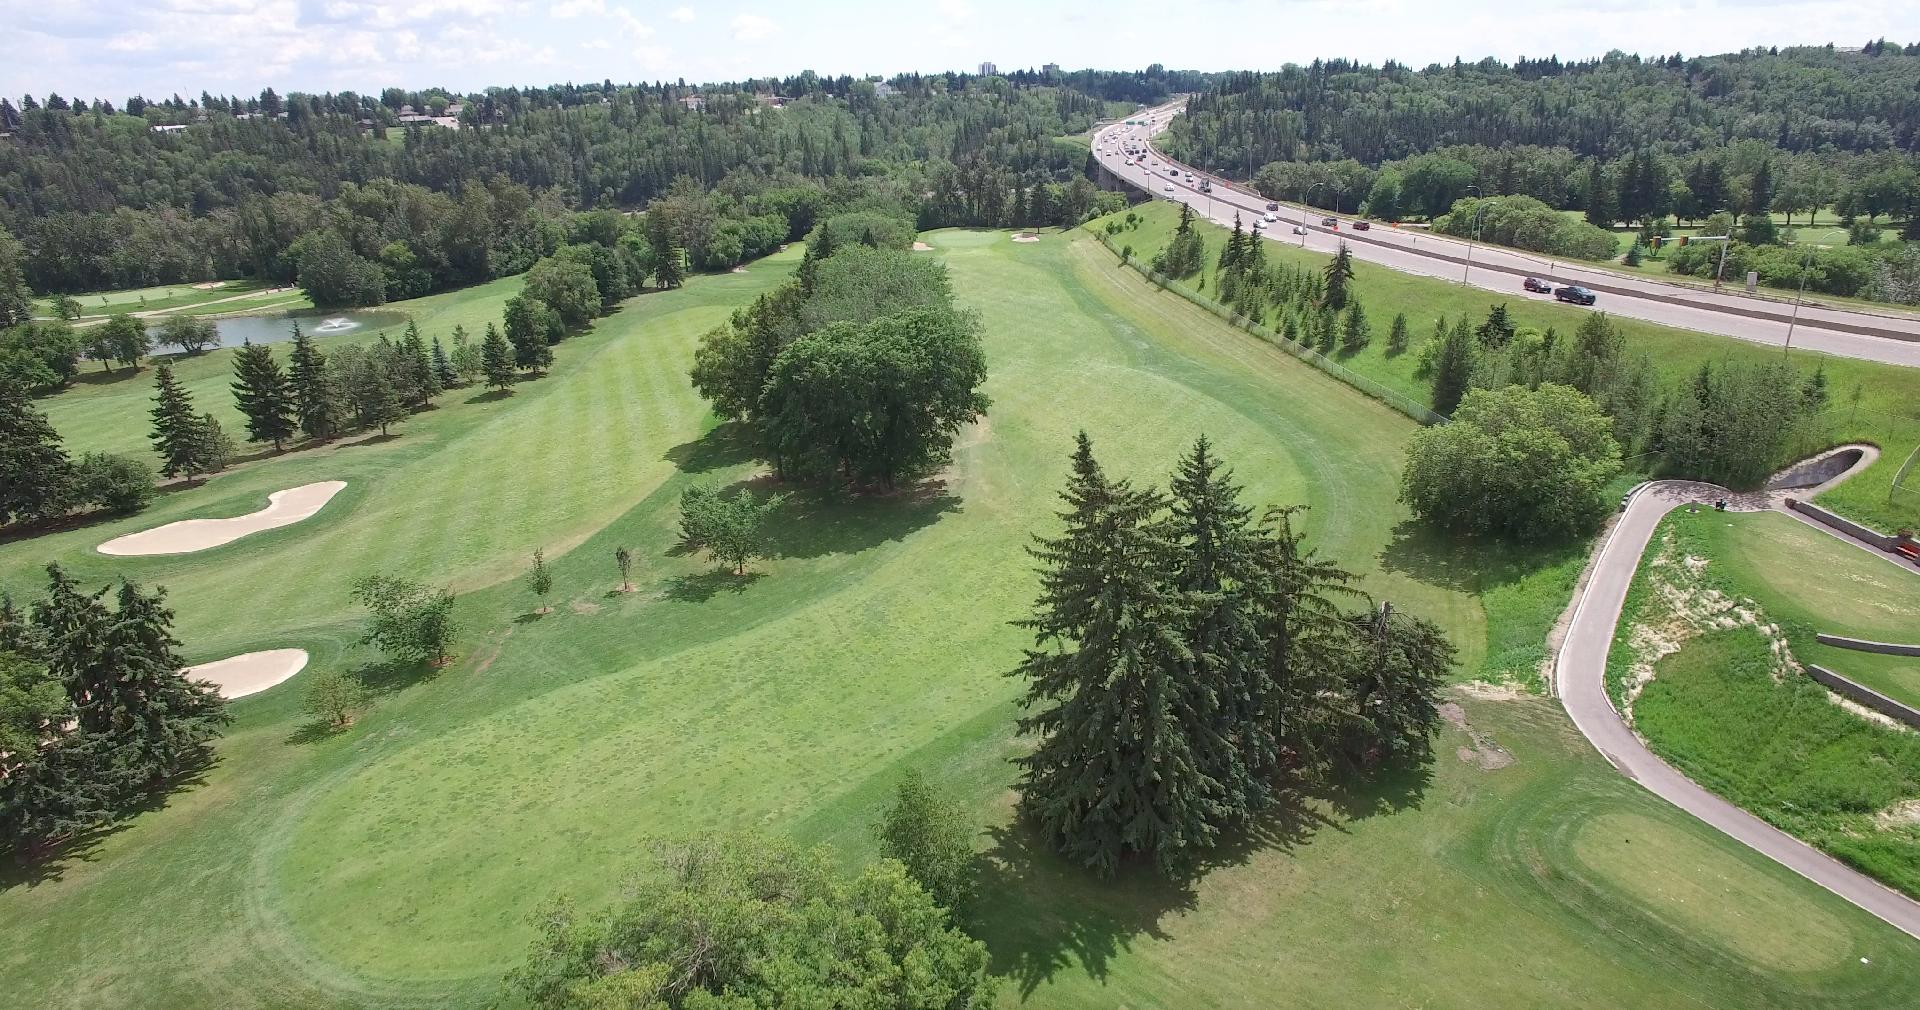 Golf Course Drone Video Edmonton